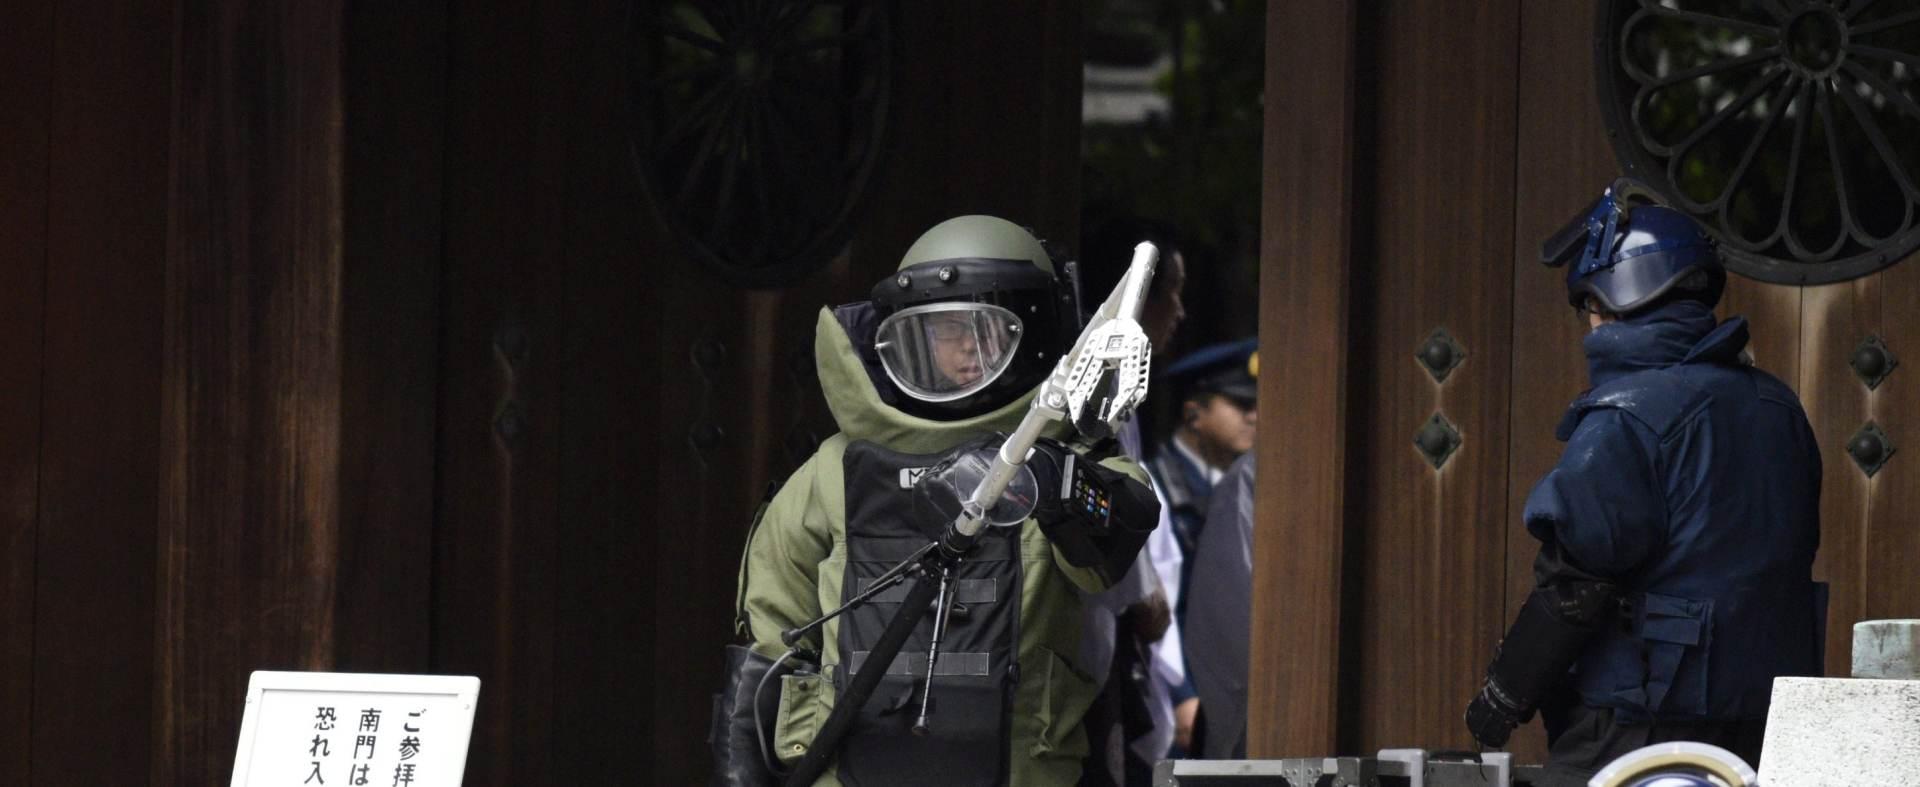 SIMBOL MILITARIZMA: Eksplozija u japanskom svetištu Yasukuni